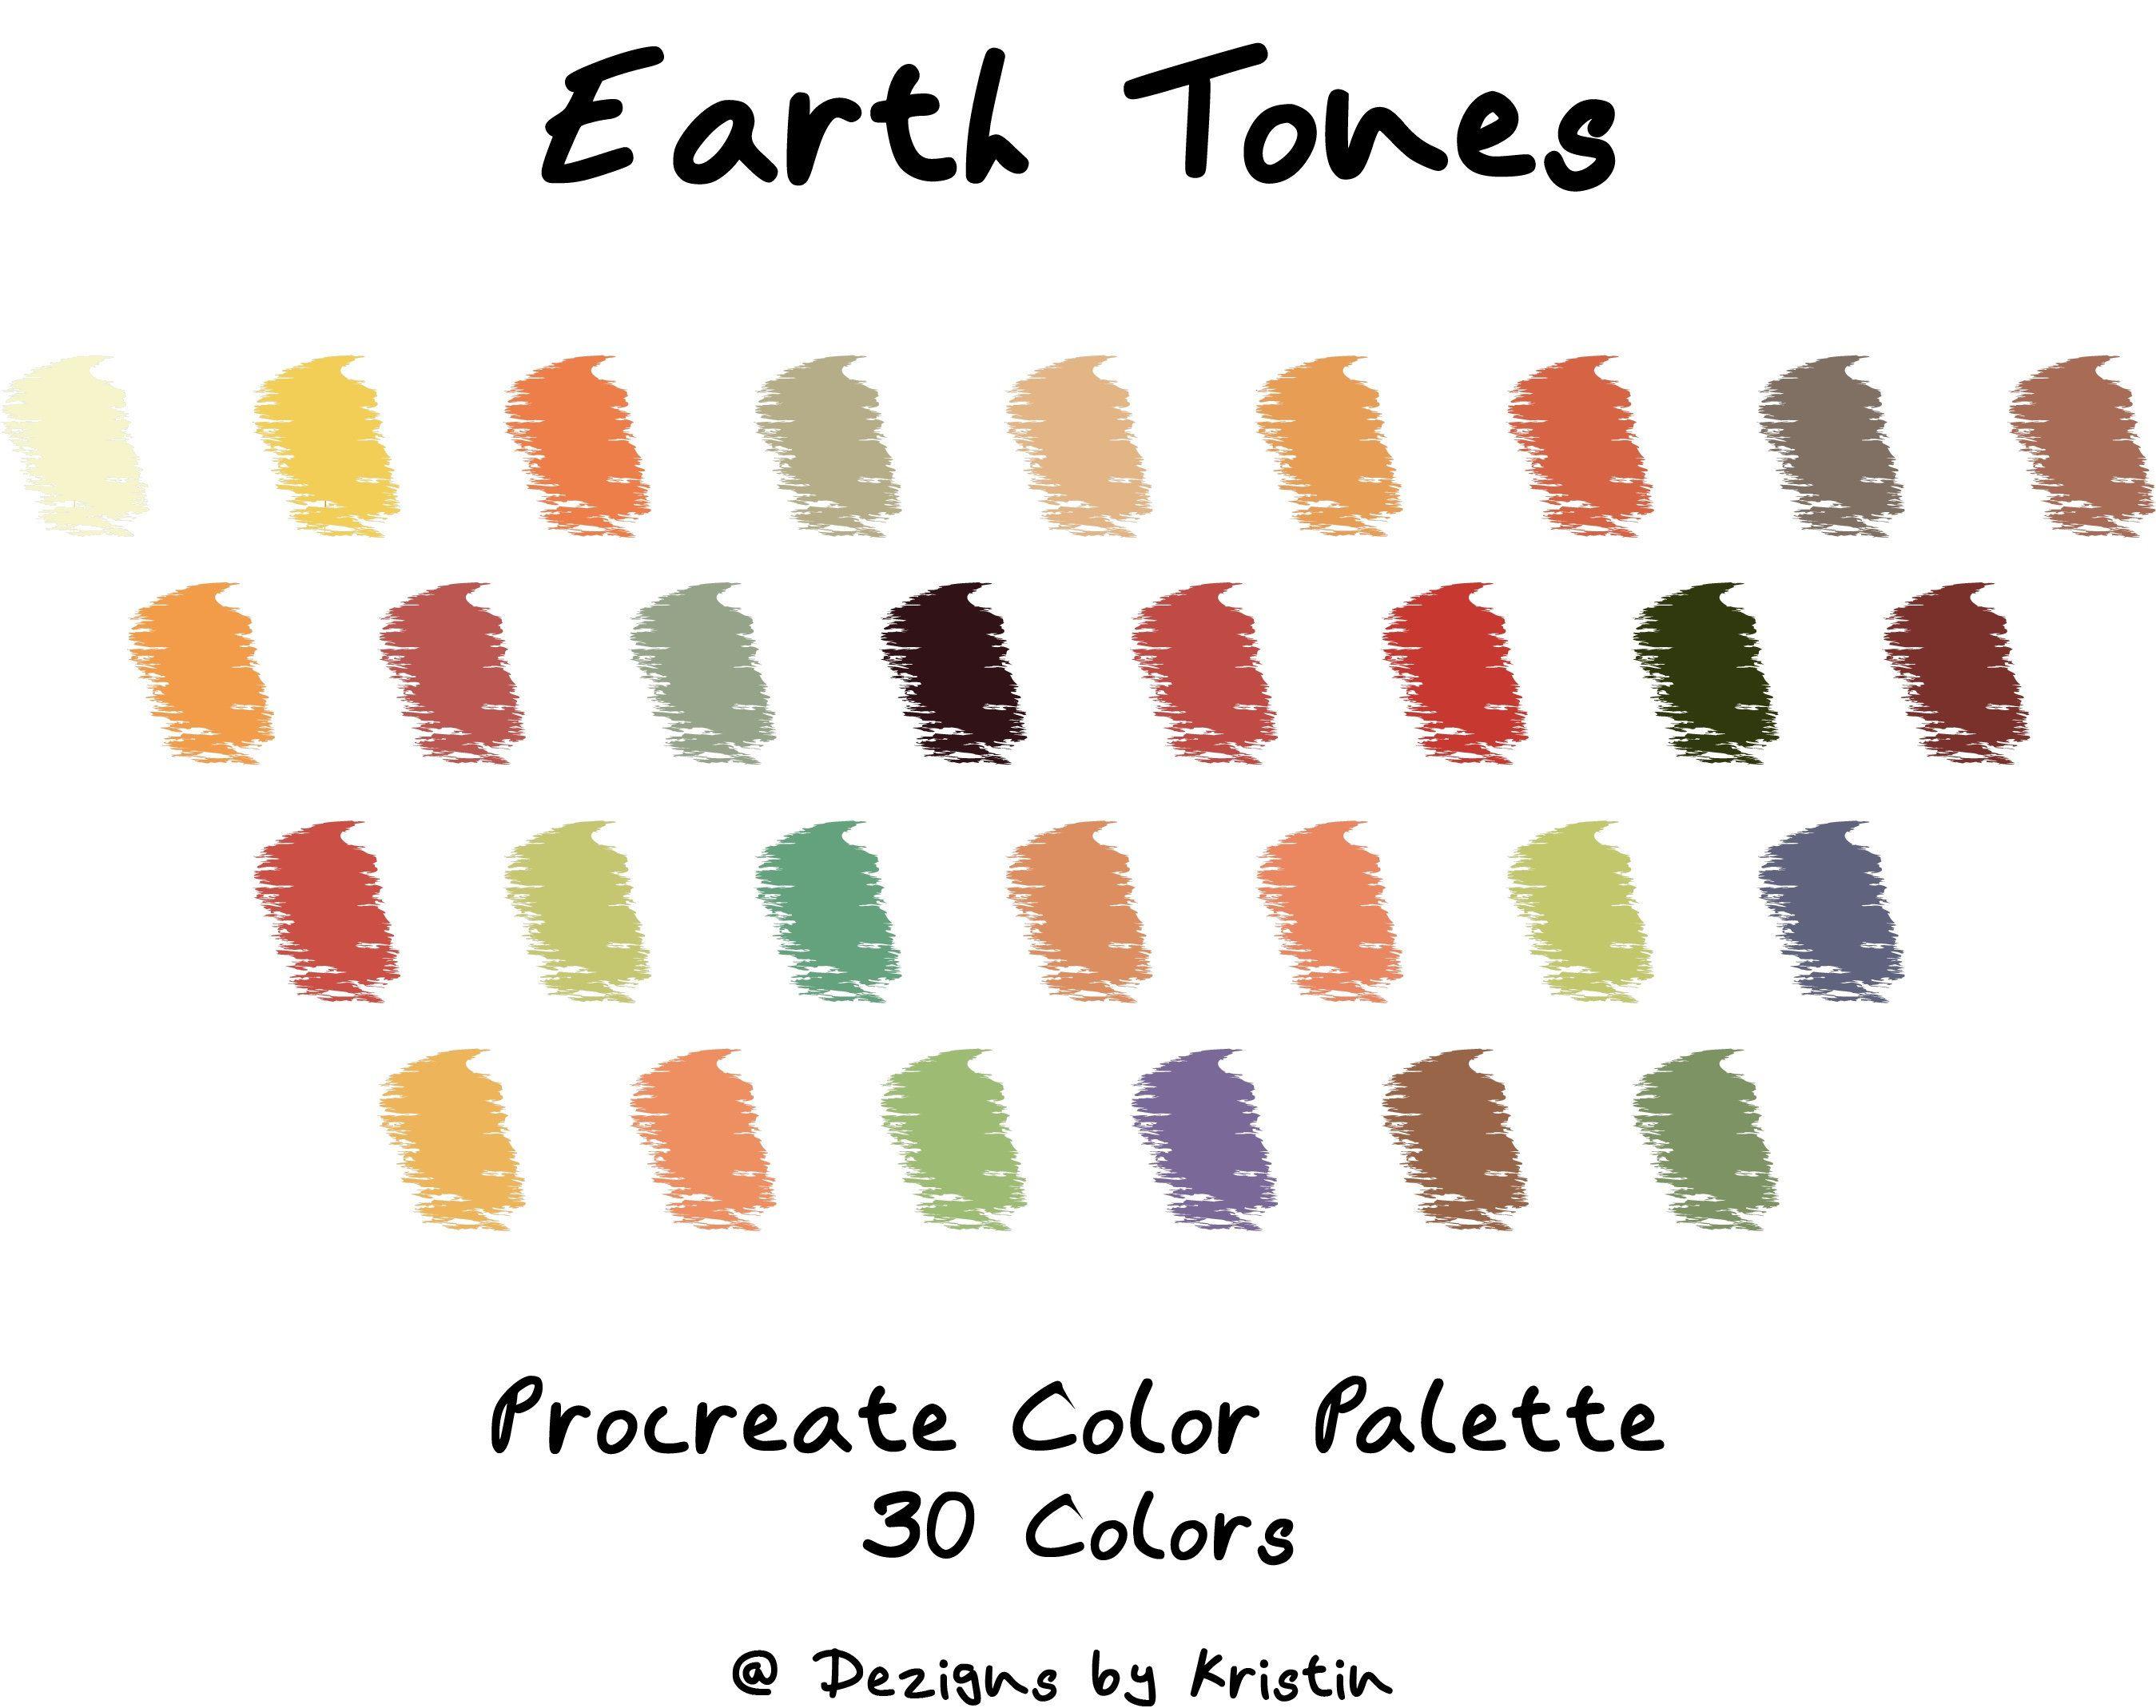 Earth Tones Color Palette Procreate Swatches Color Etsy Sunset Color Palette Earth Tone Colors Color Palette